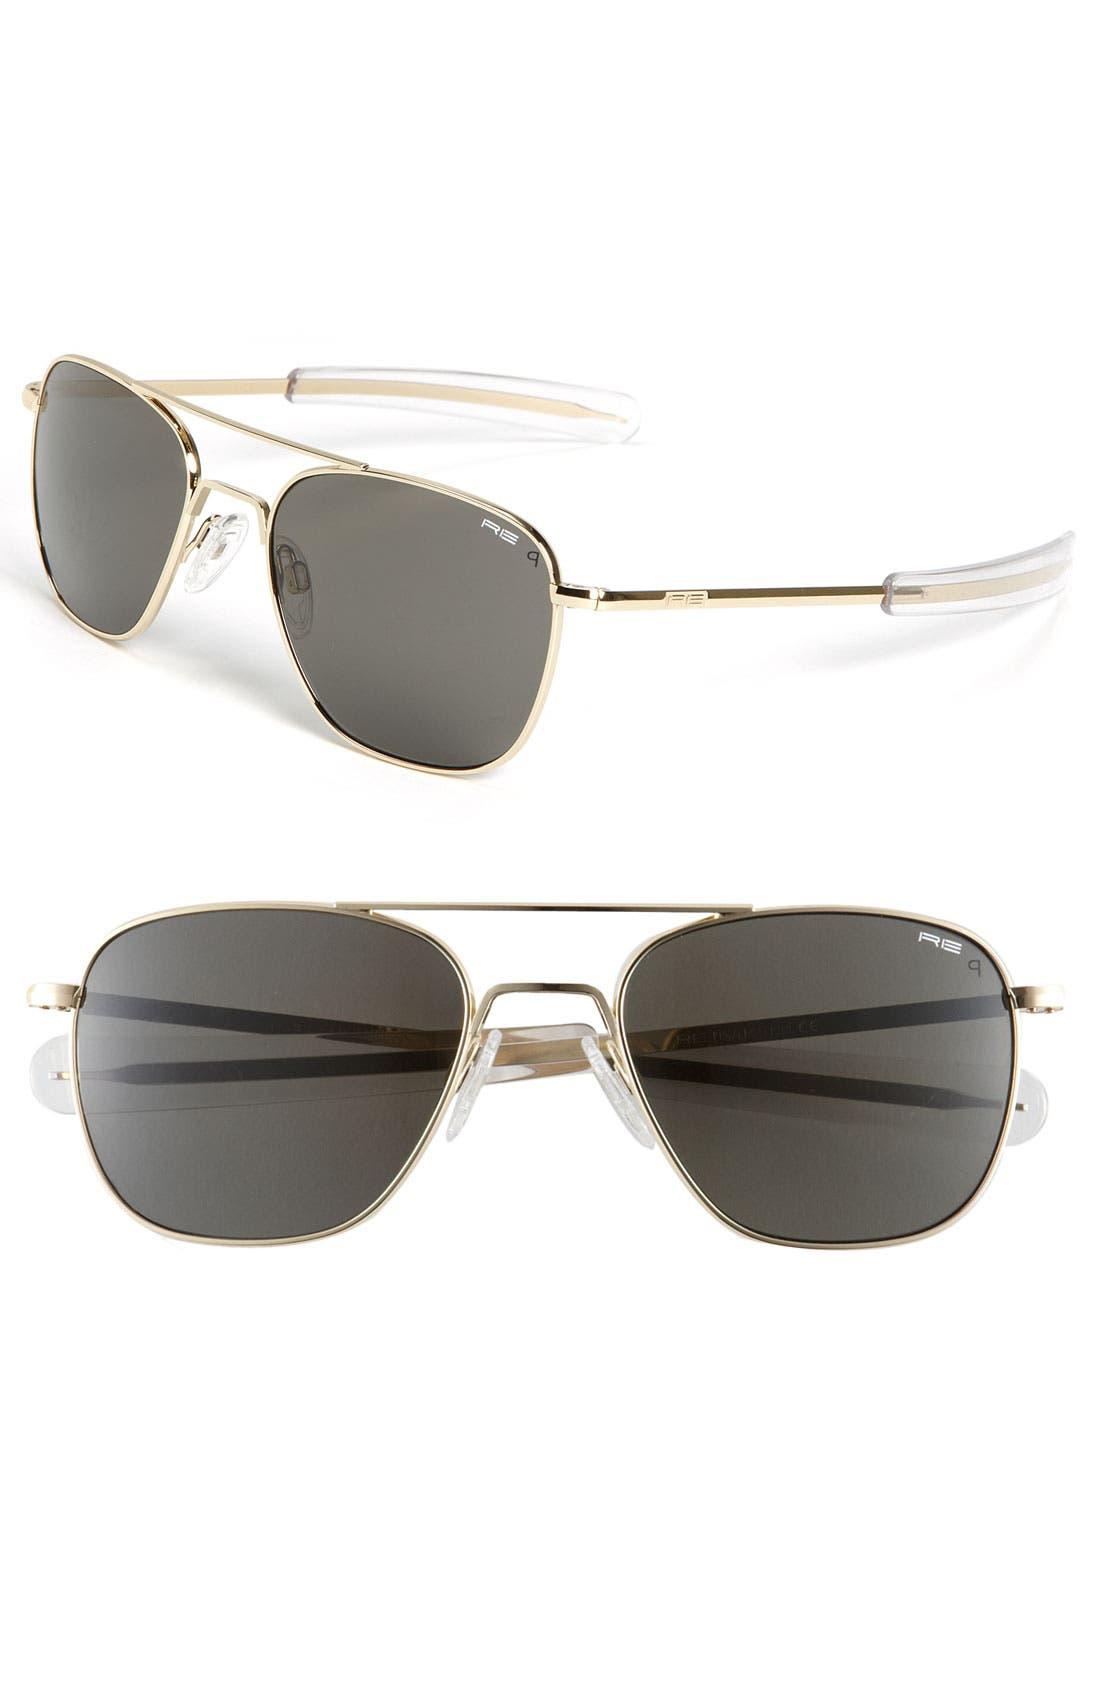 55mm Aviator Sunglasses,                             Main thumbnail 1, color,                             710